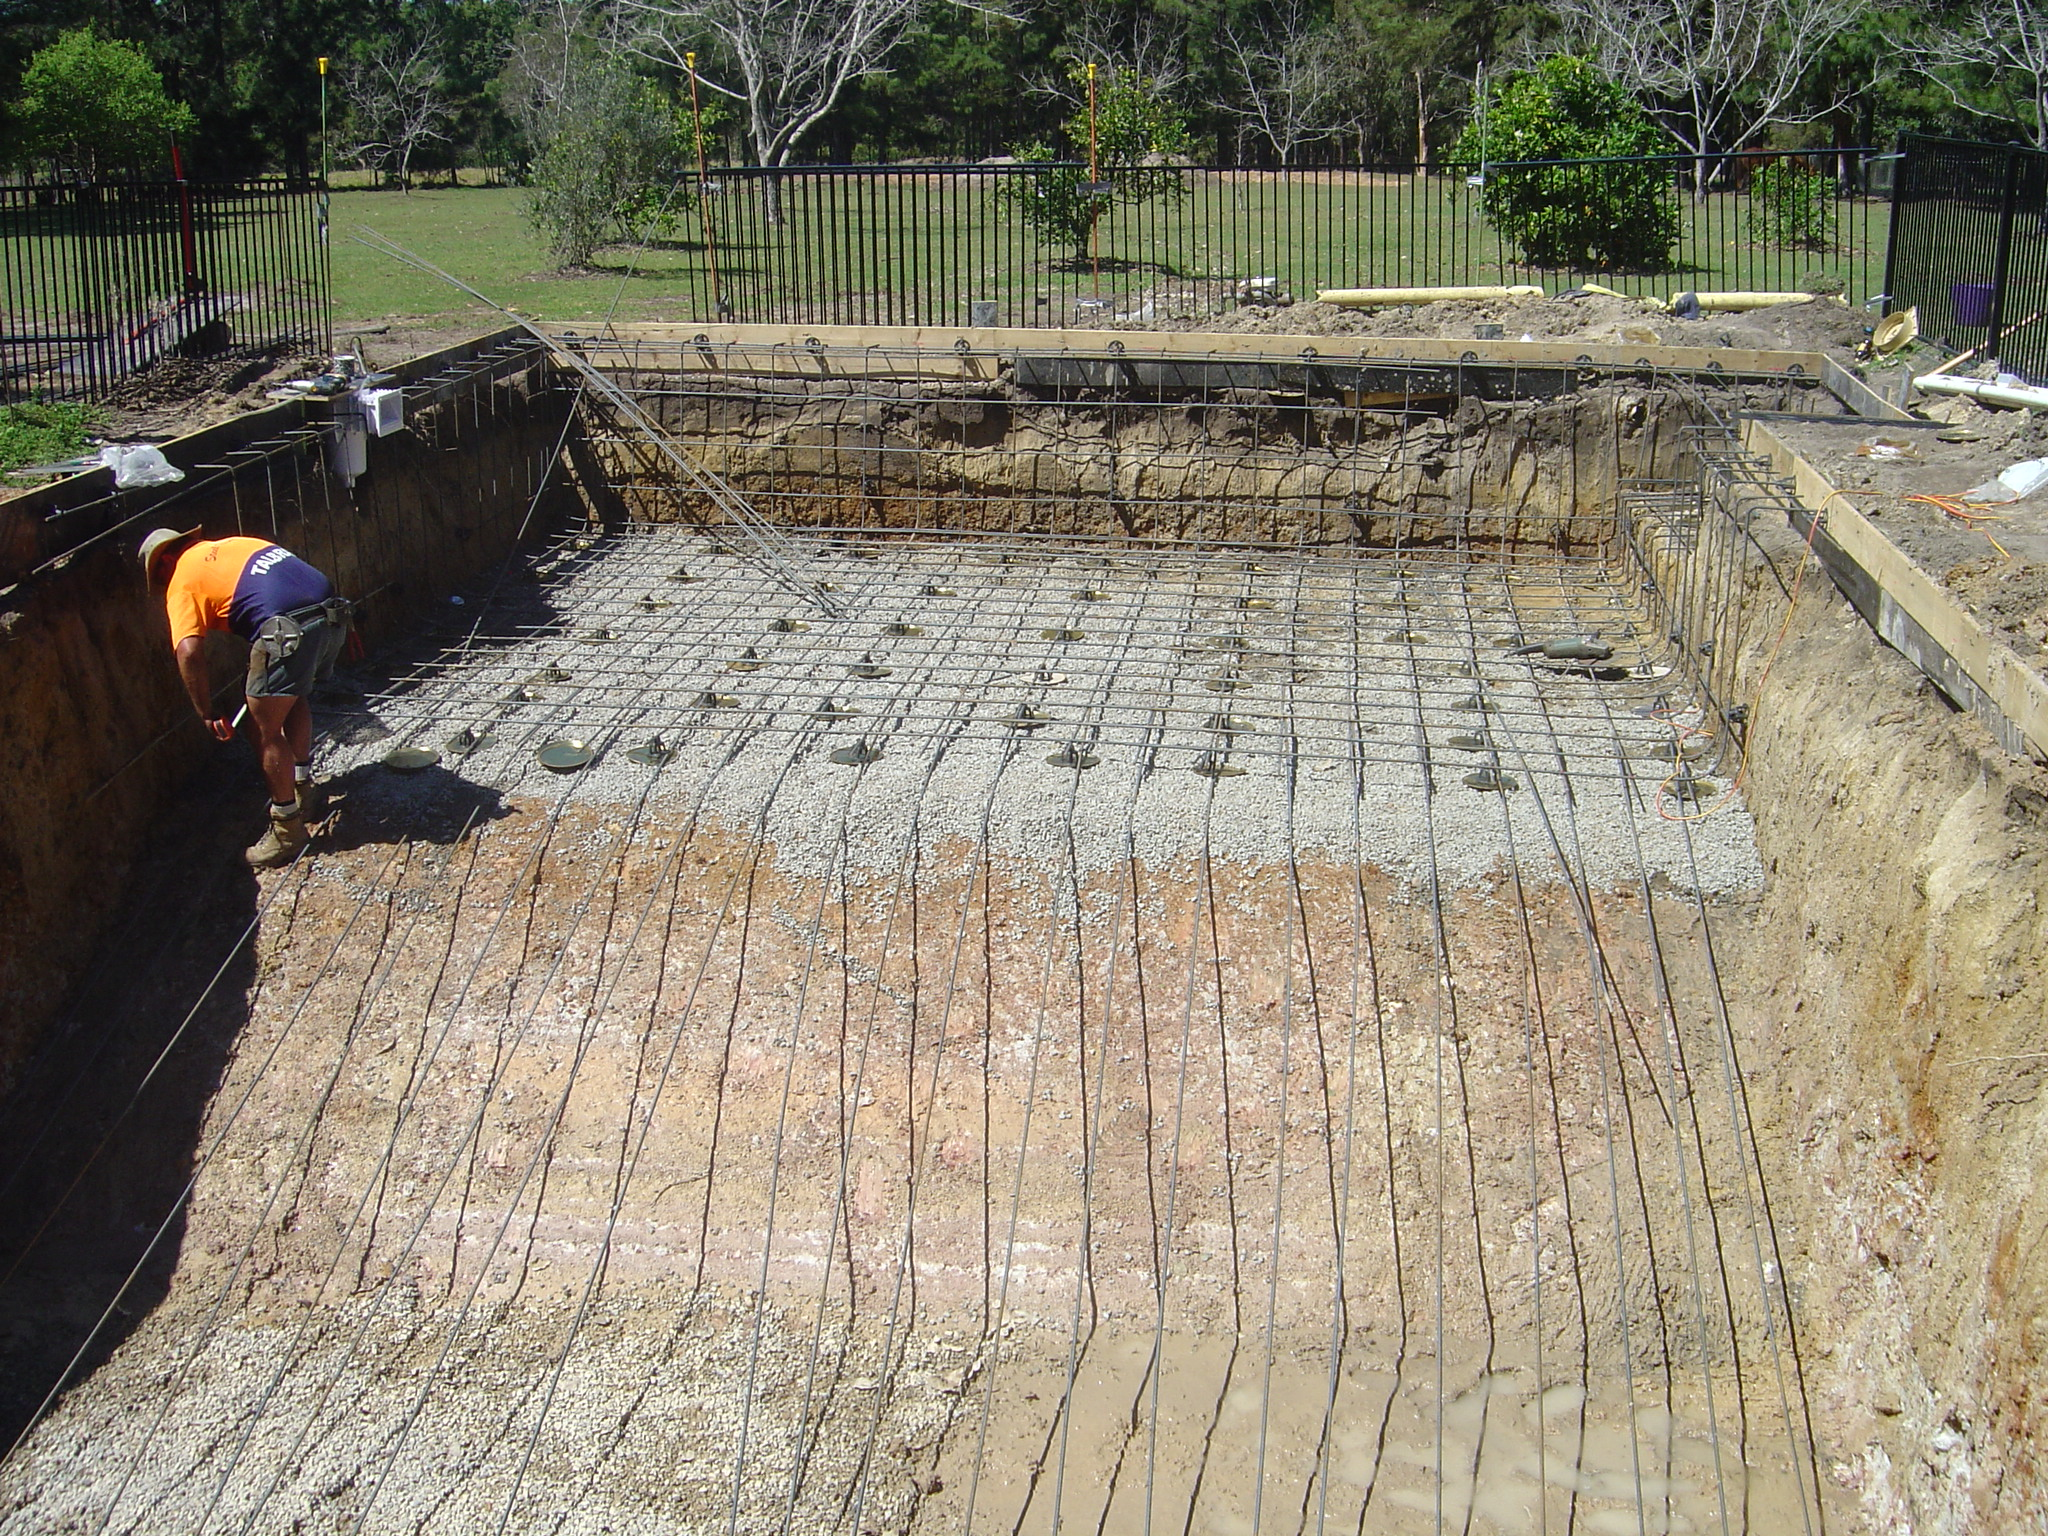 diy concrete pool australia diy virtual fretboard. Black Bedroom Furniture Sets. Home Design Ideas